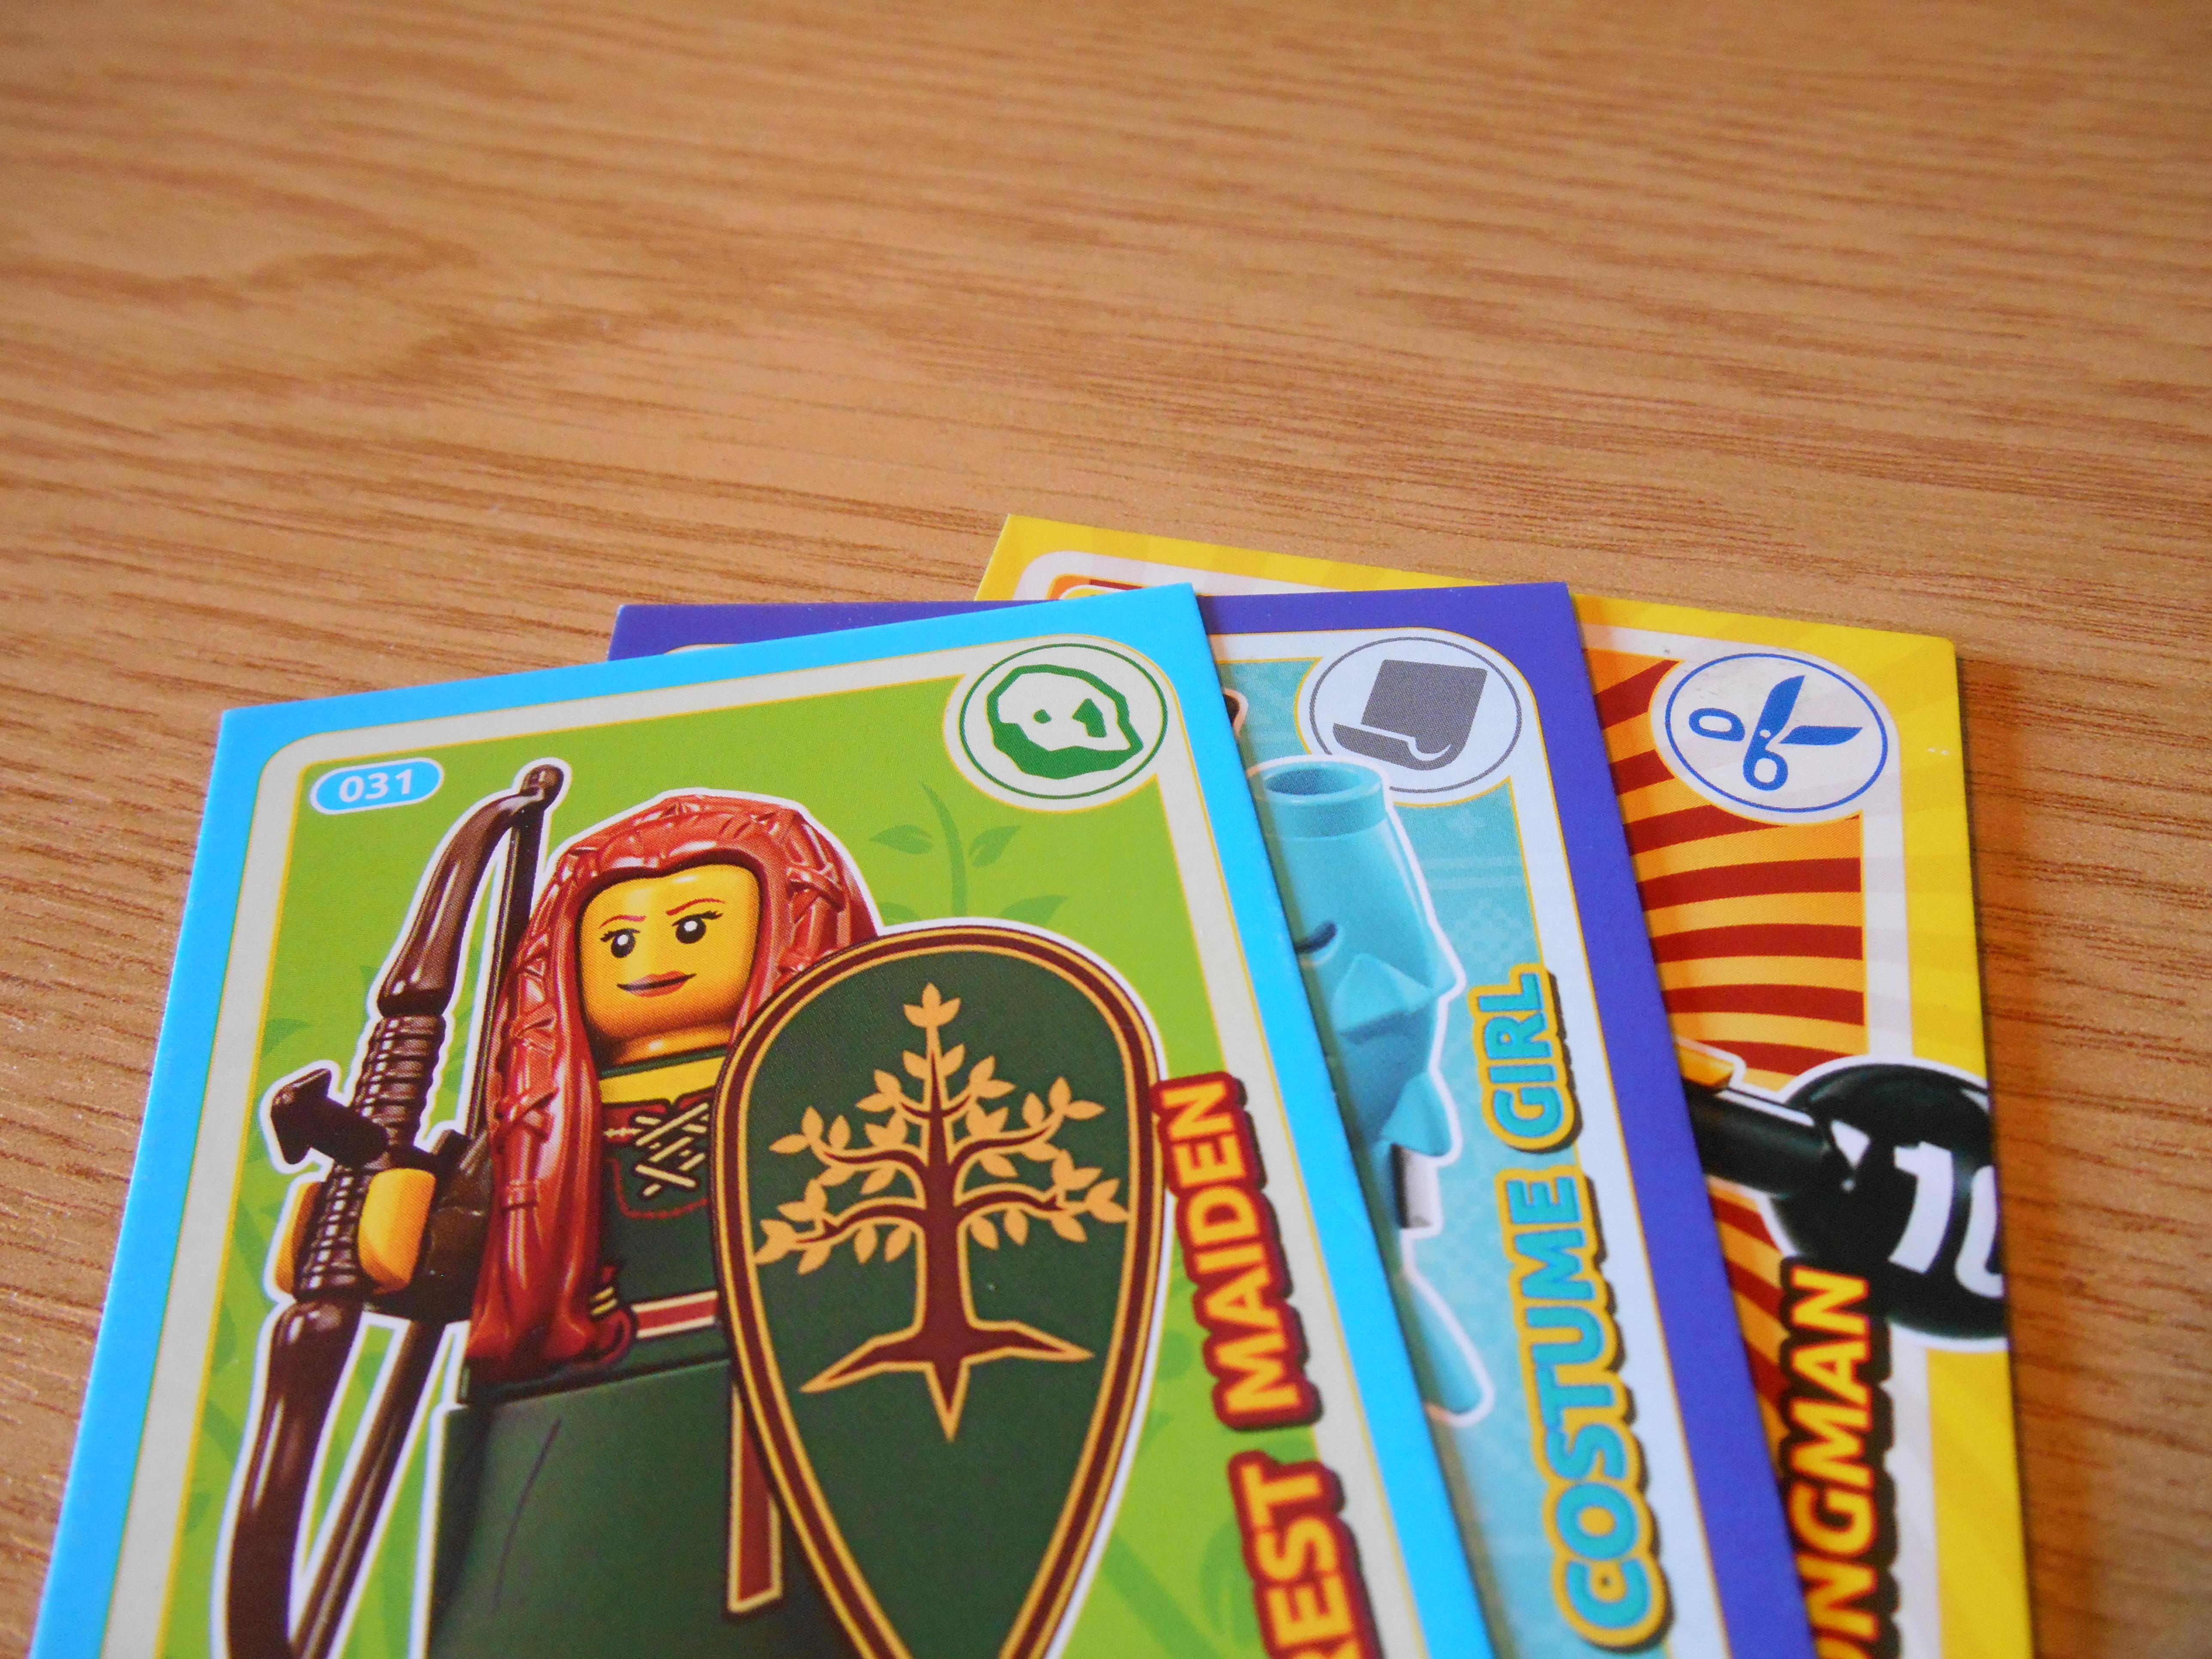 Lego rock, paper, scissors cards